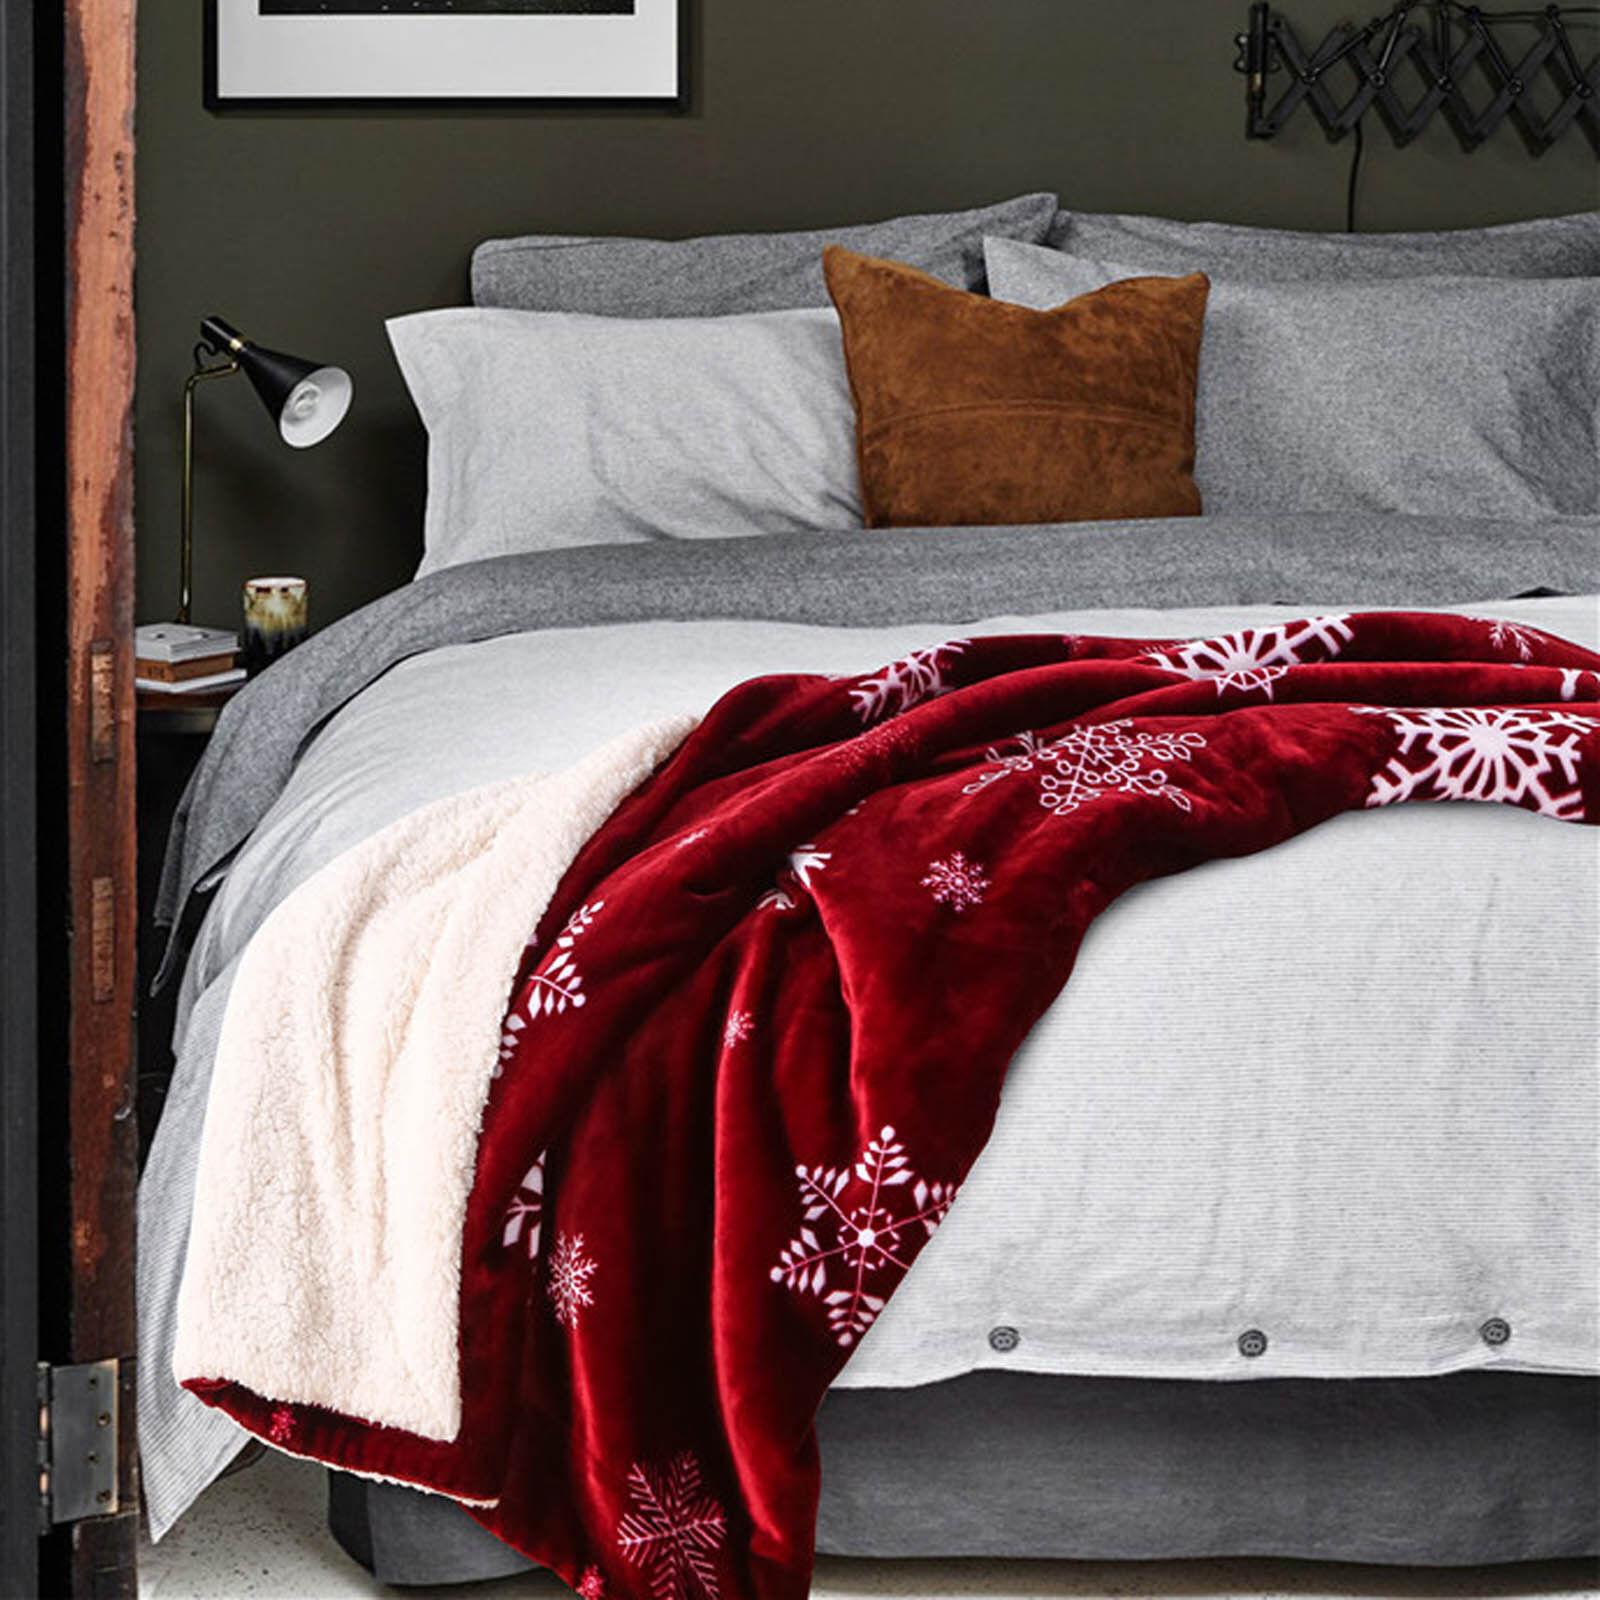 Plush Throw Blanket Snowflake Design, Red White Great Gift For Christmas, New